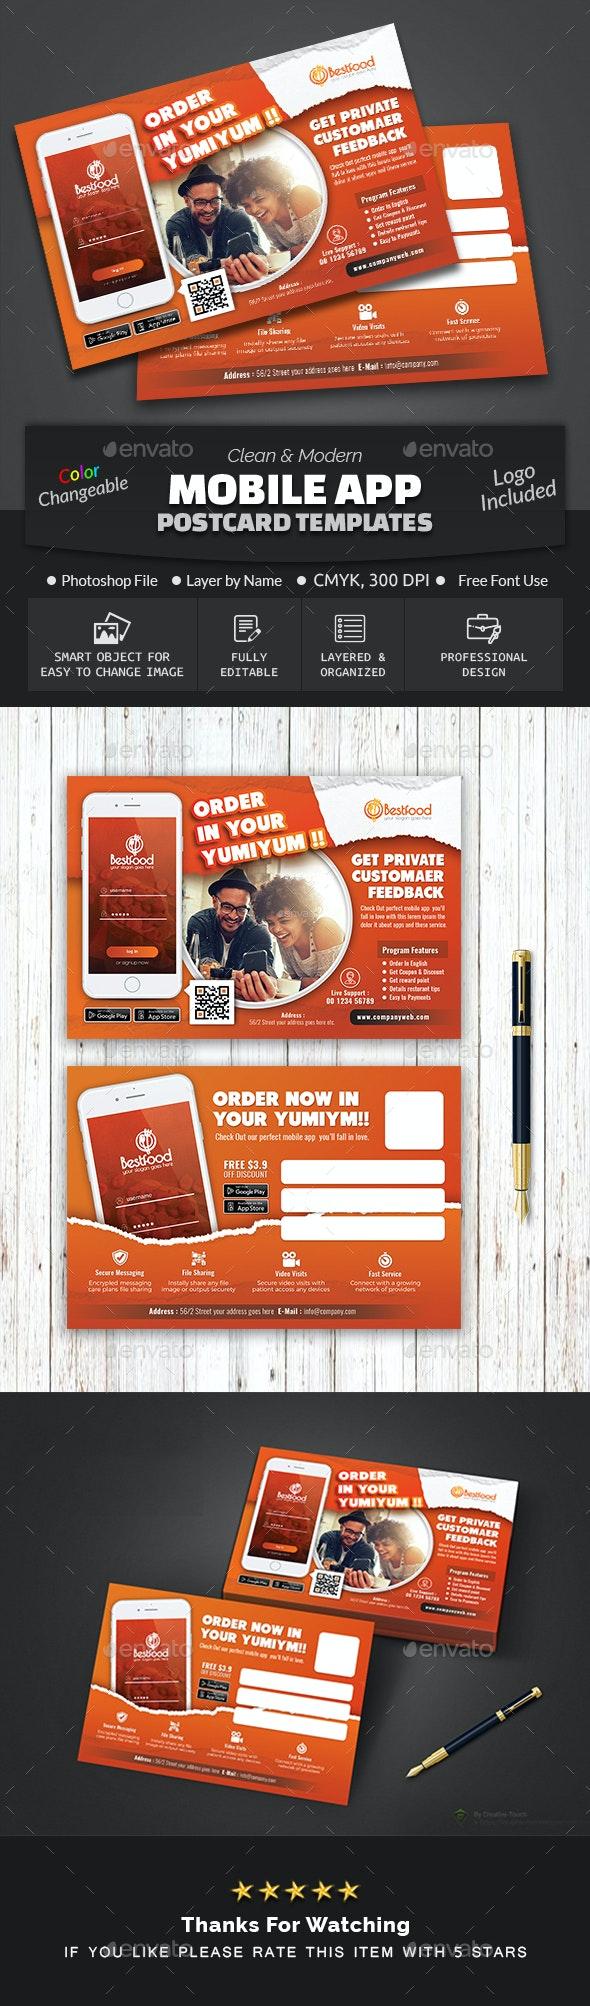 Mobile App Postcard Template - Cards & Invites Print Templates